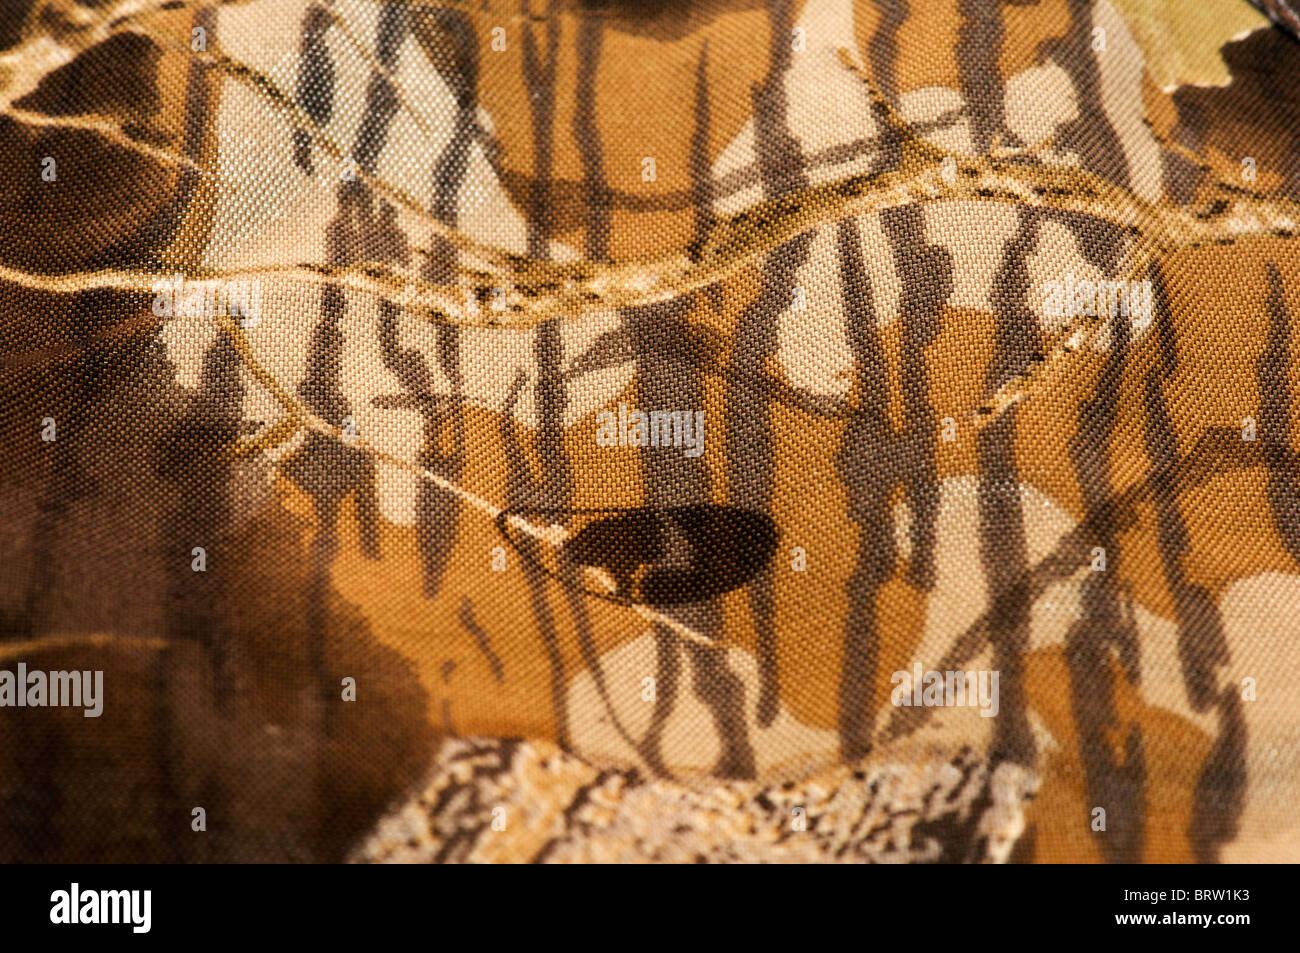 Camo pattern - Stock Image